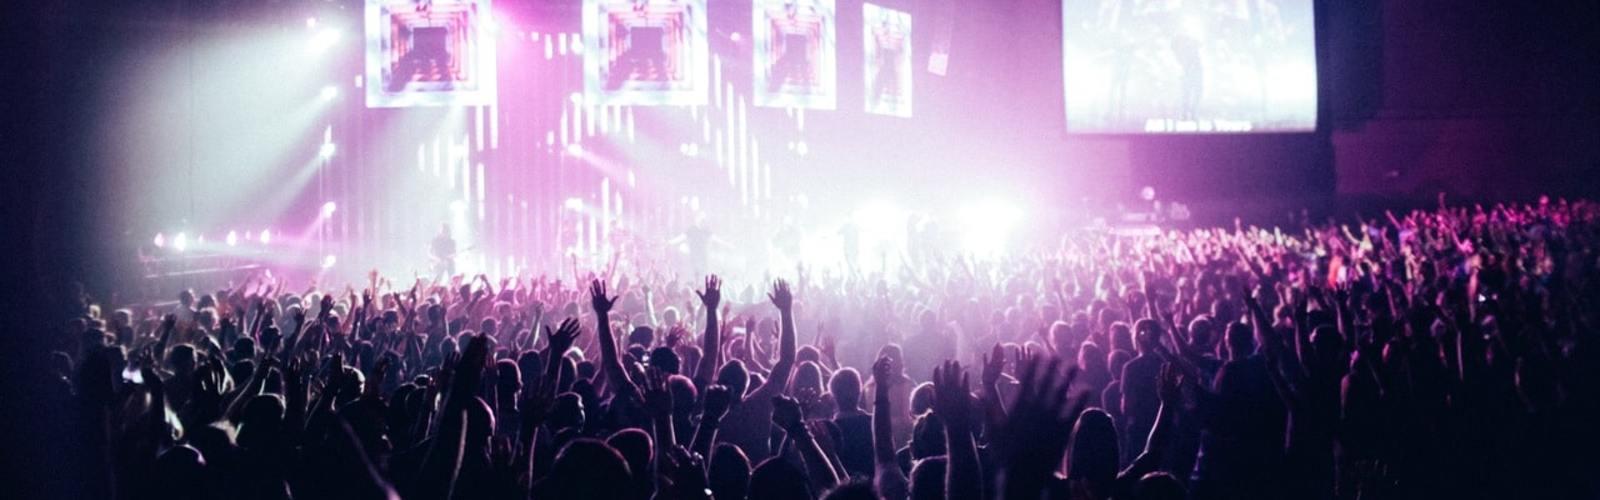 Top 6 European Festivals in November 2016